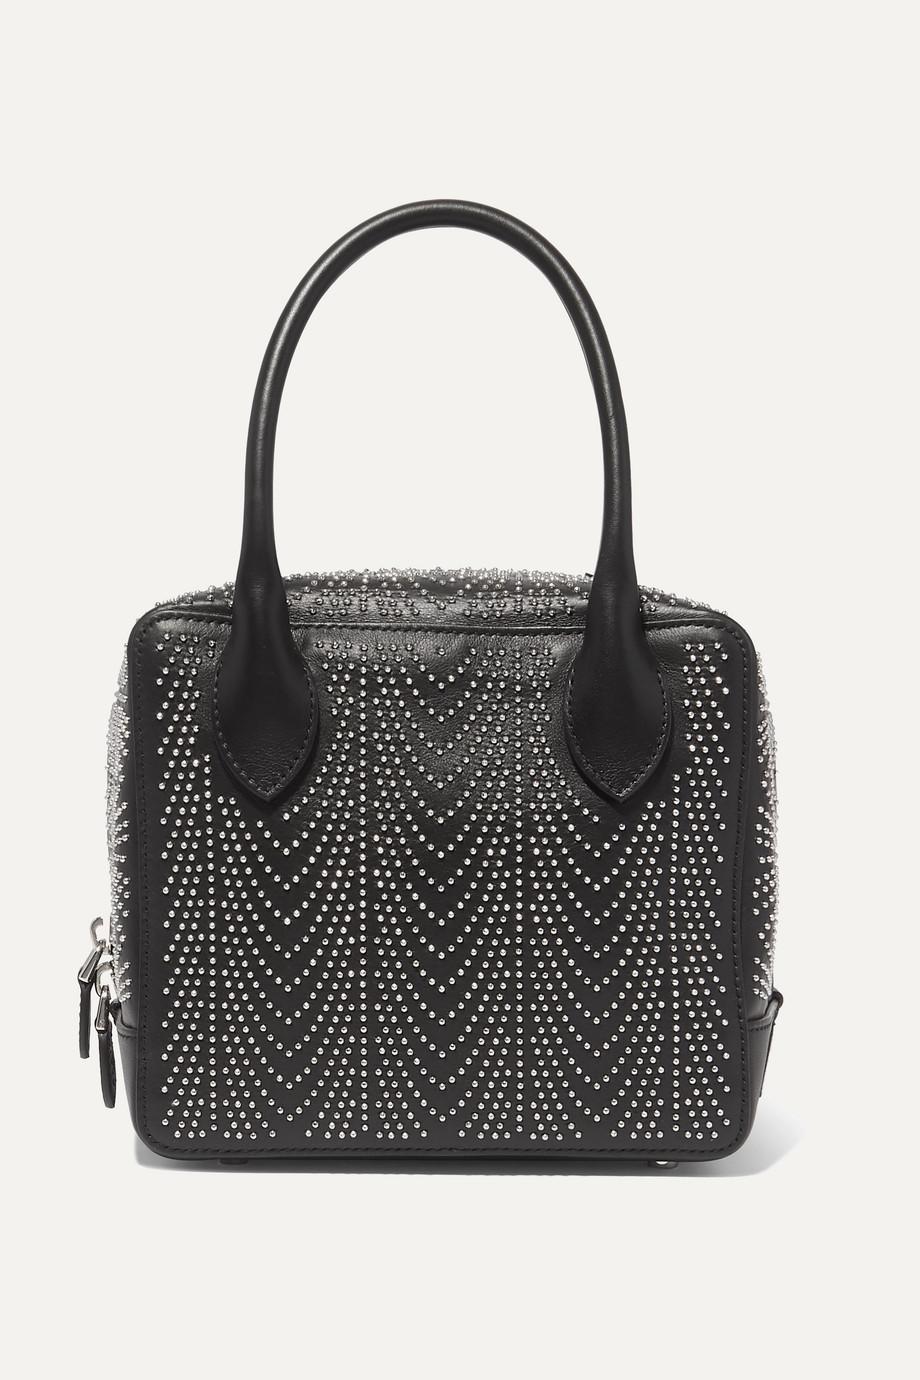 Alaïa Studded leather tote